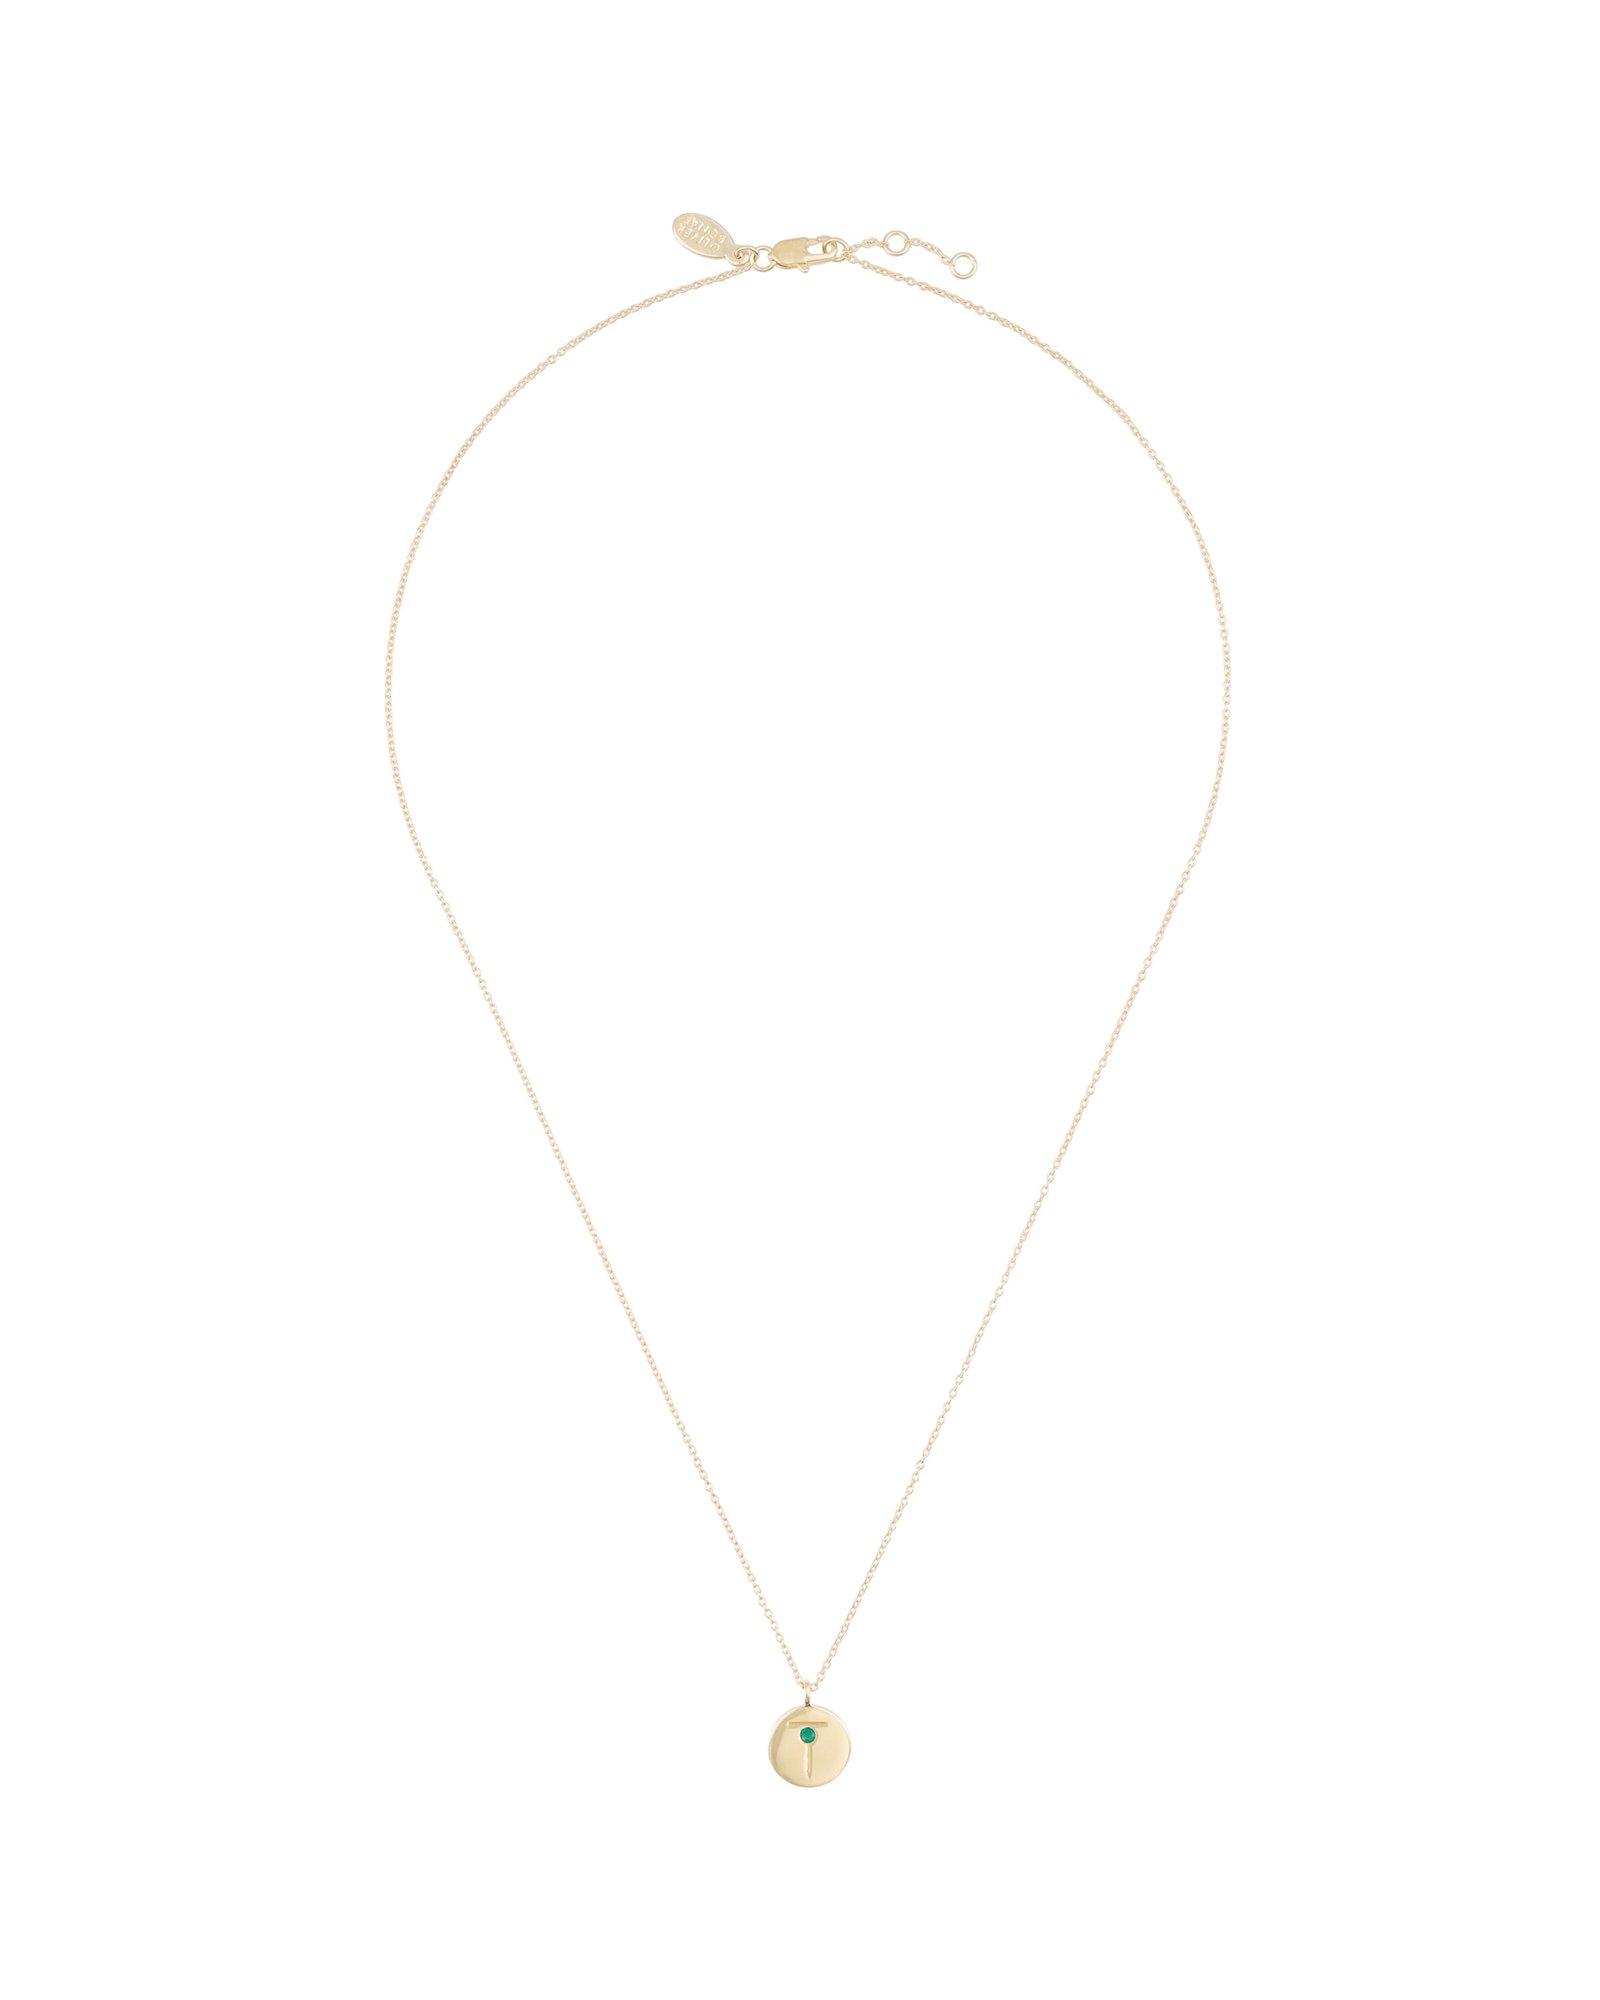 Oliver bonas mujeres alfabeto Disco Collar Colgante de oro plateado